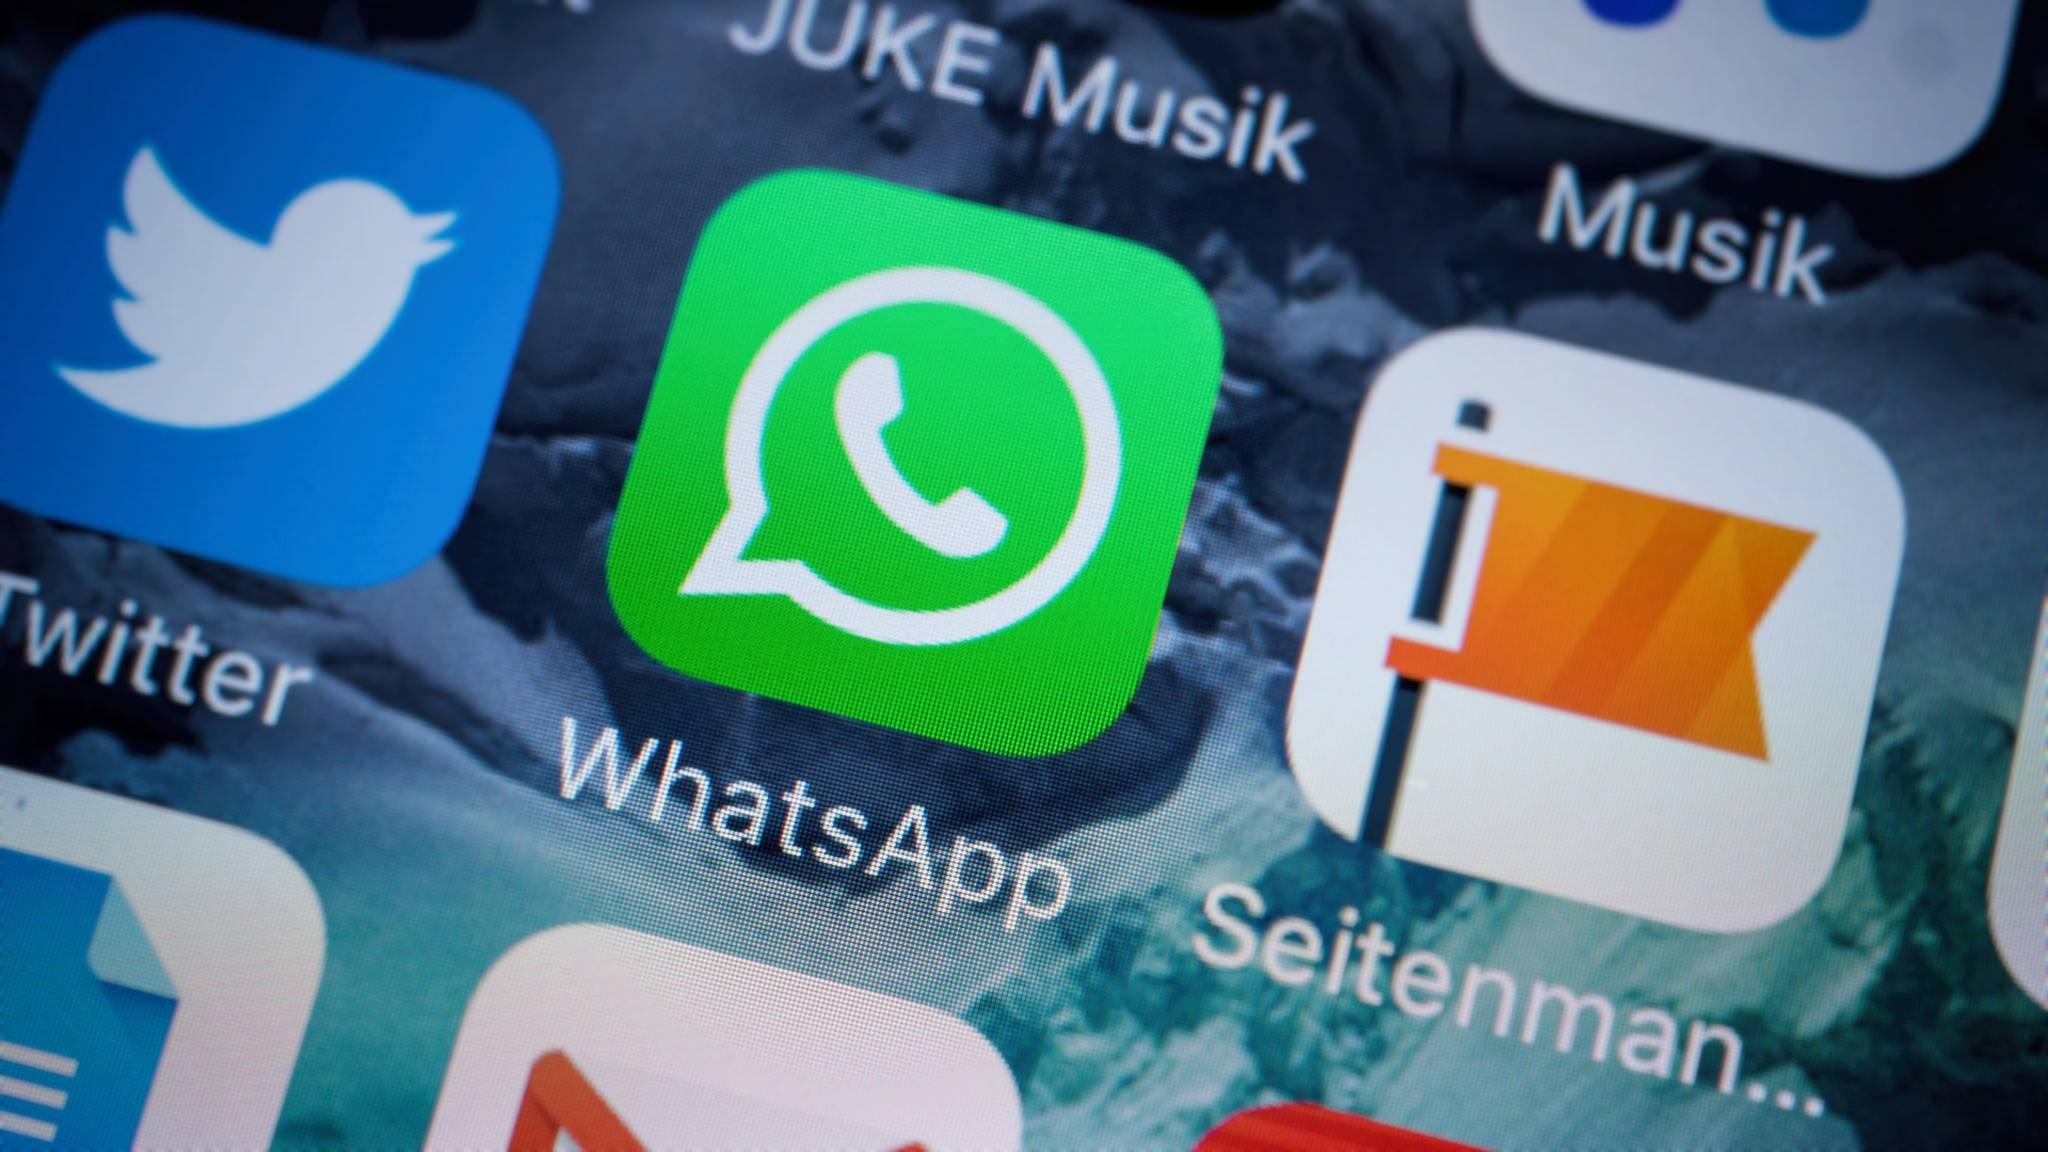 Smartphone verloren? Dann lass Dein WhatsApp-Konto besser sperren.